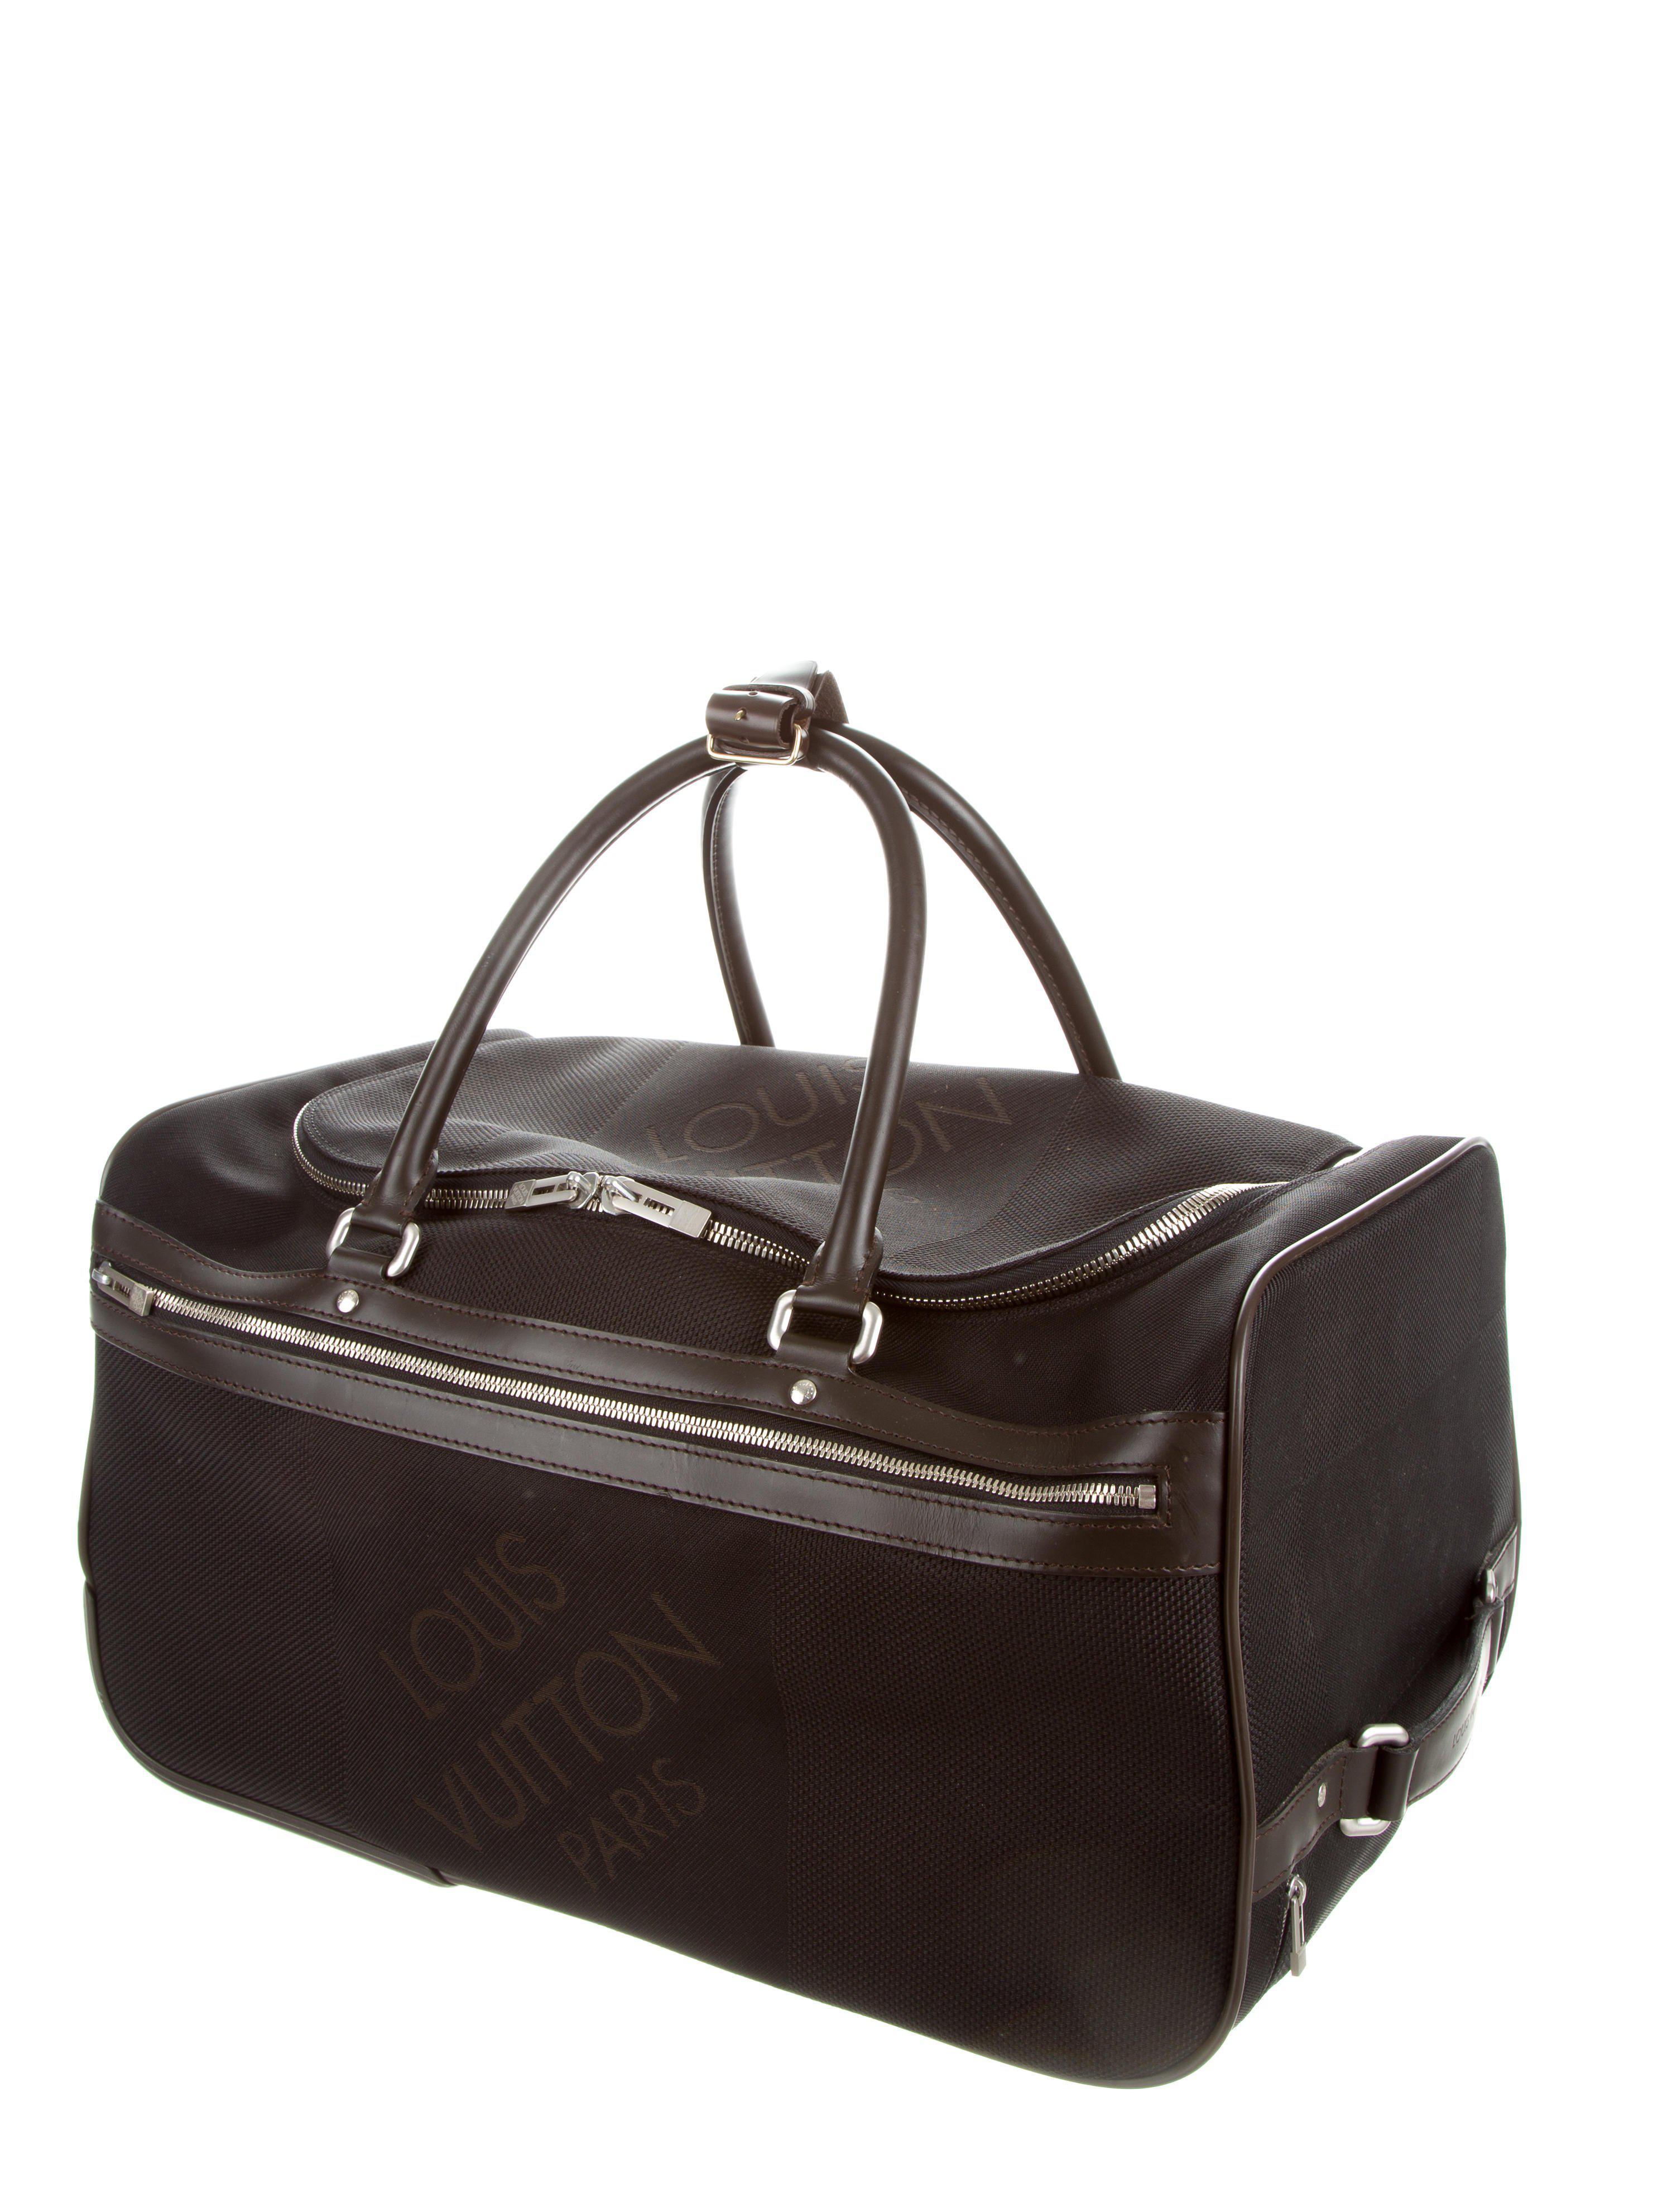 Louis Vuitton Monogram Eole 50 Rolling Travel Duffel Bag   ReGreen ... 65b771a45c